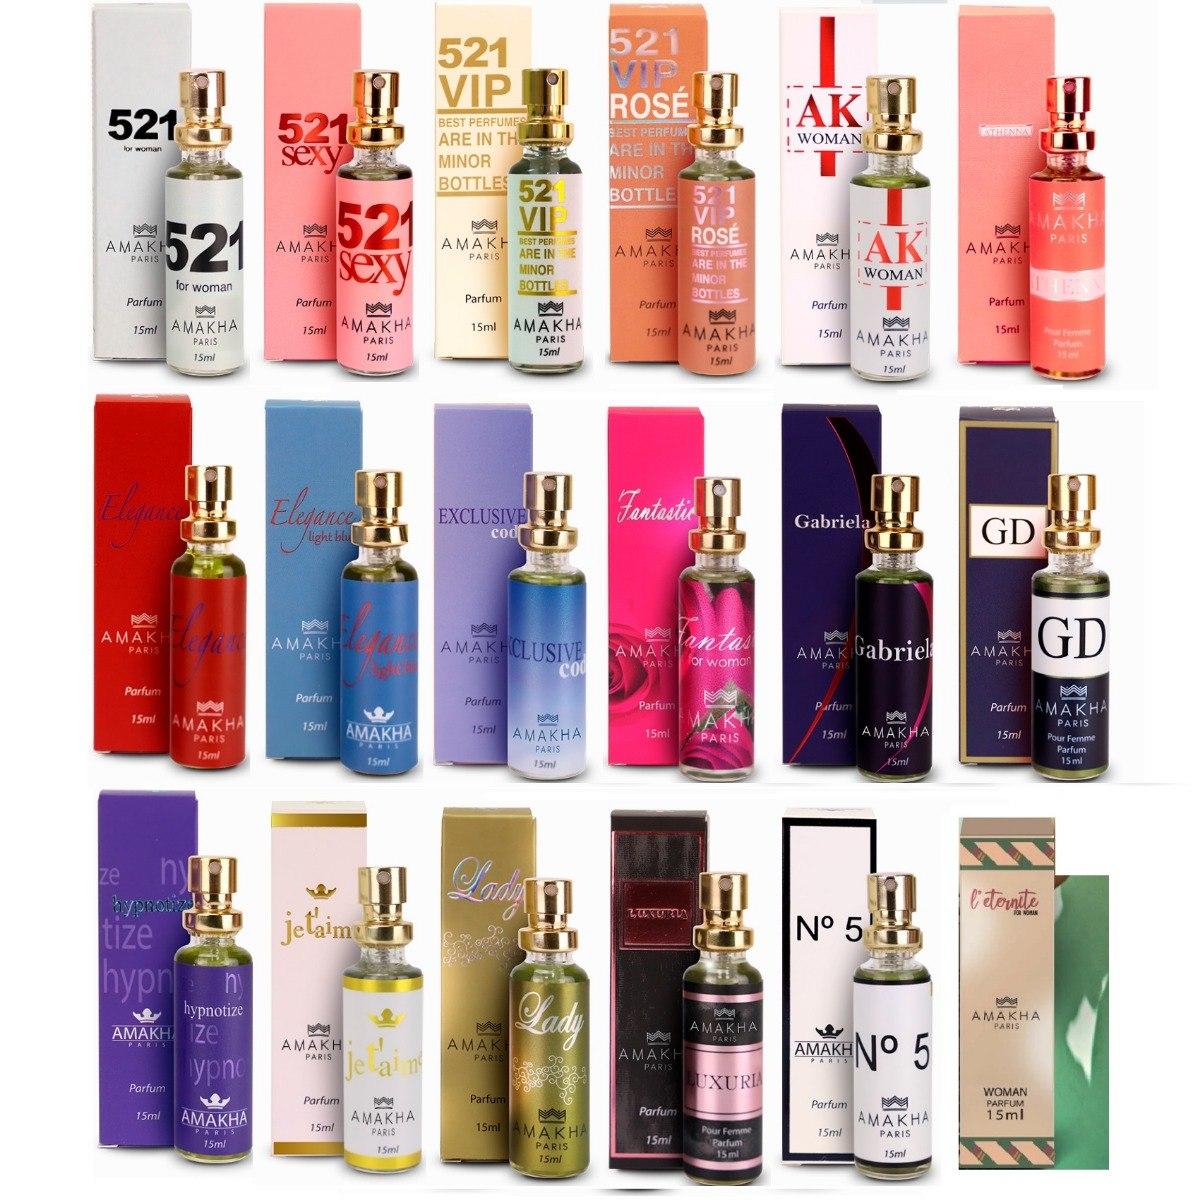 36f394c3d Perfumes Inspirados Nas Marcas Famosas Amakha Paris Fem/masc - R$ 33 ...